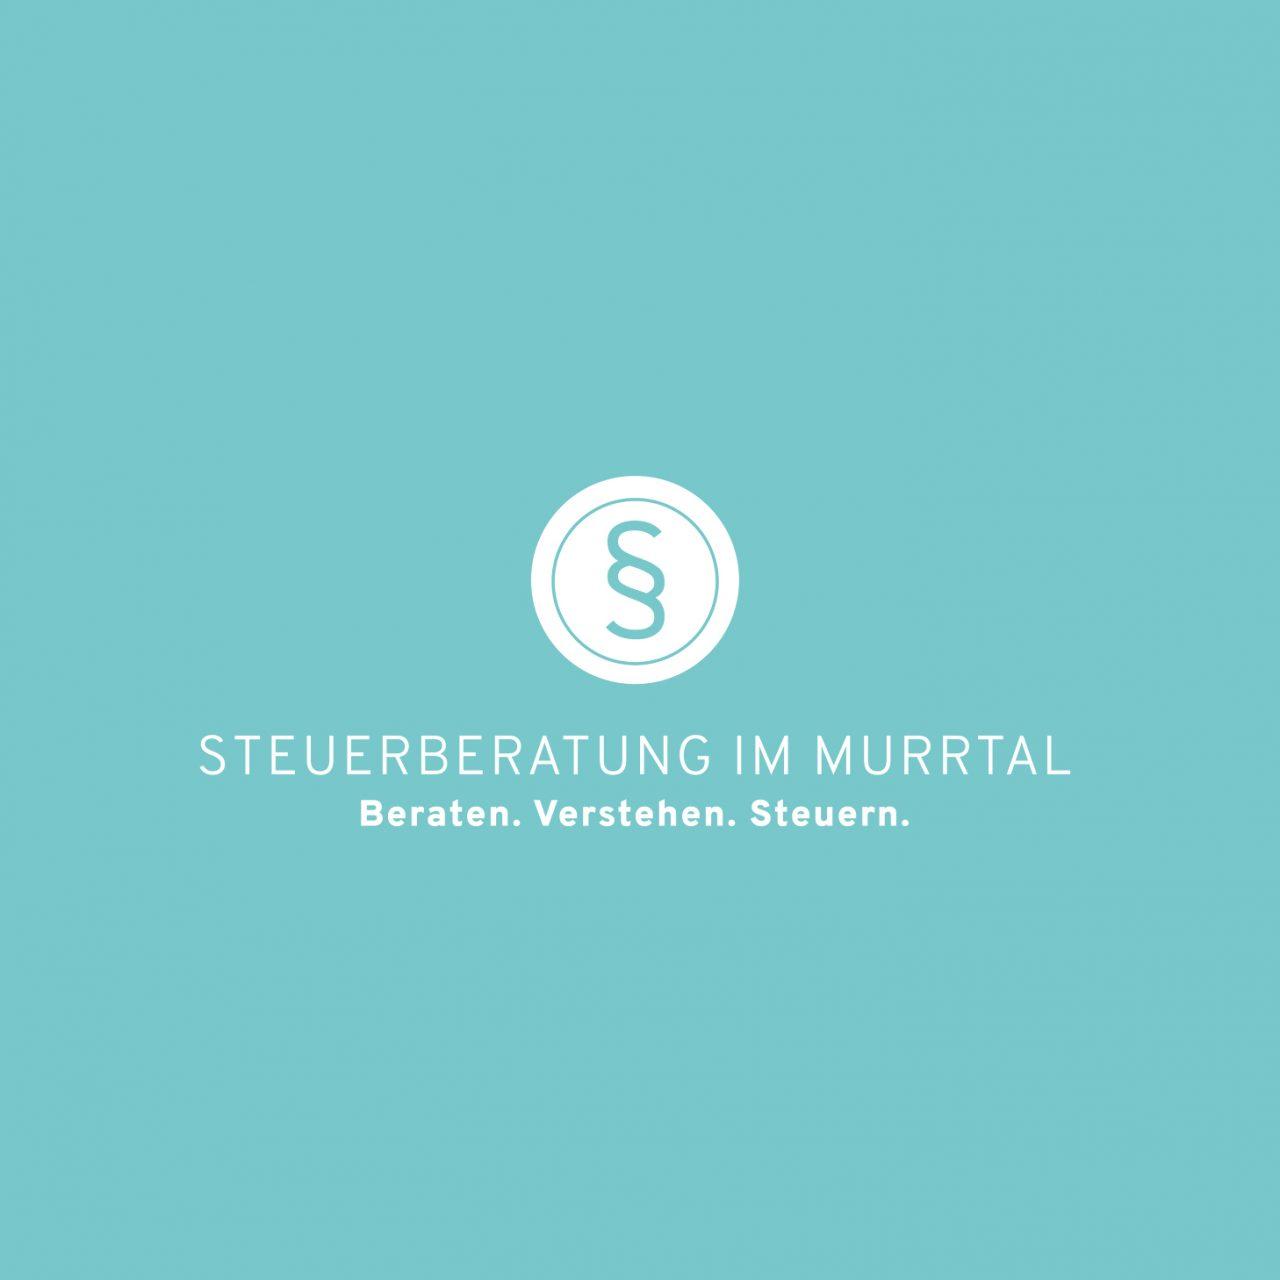 Logo Steuerberatung im Murrtal